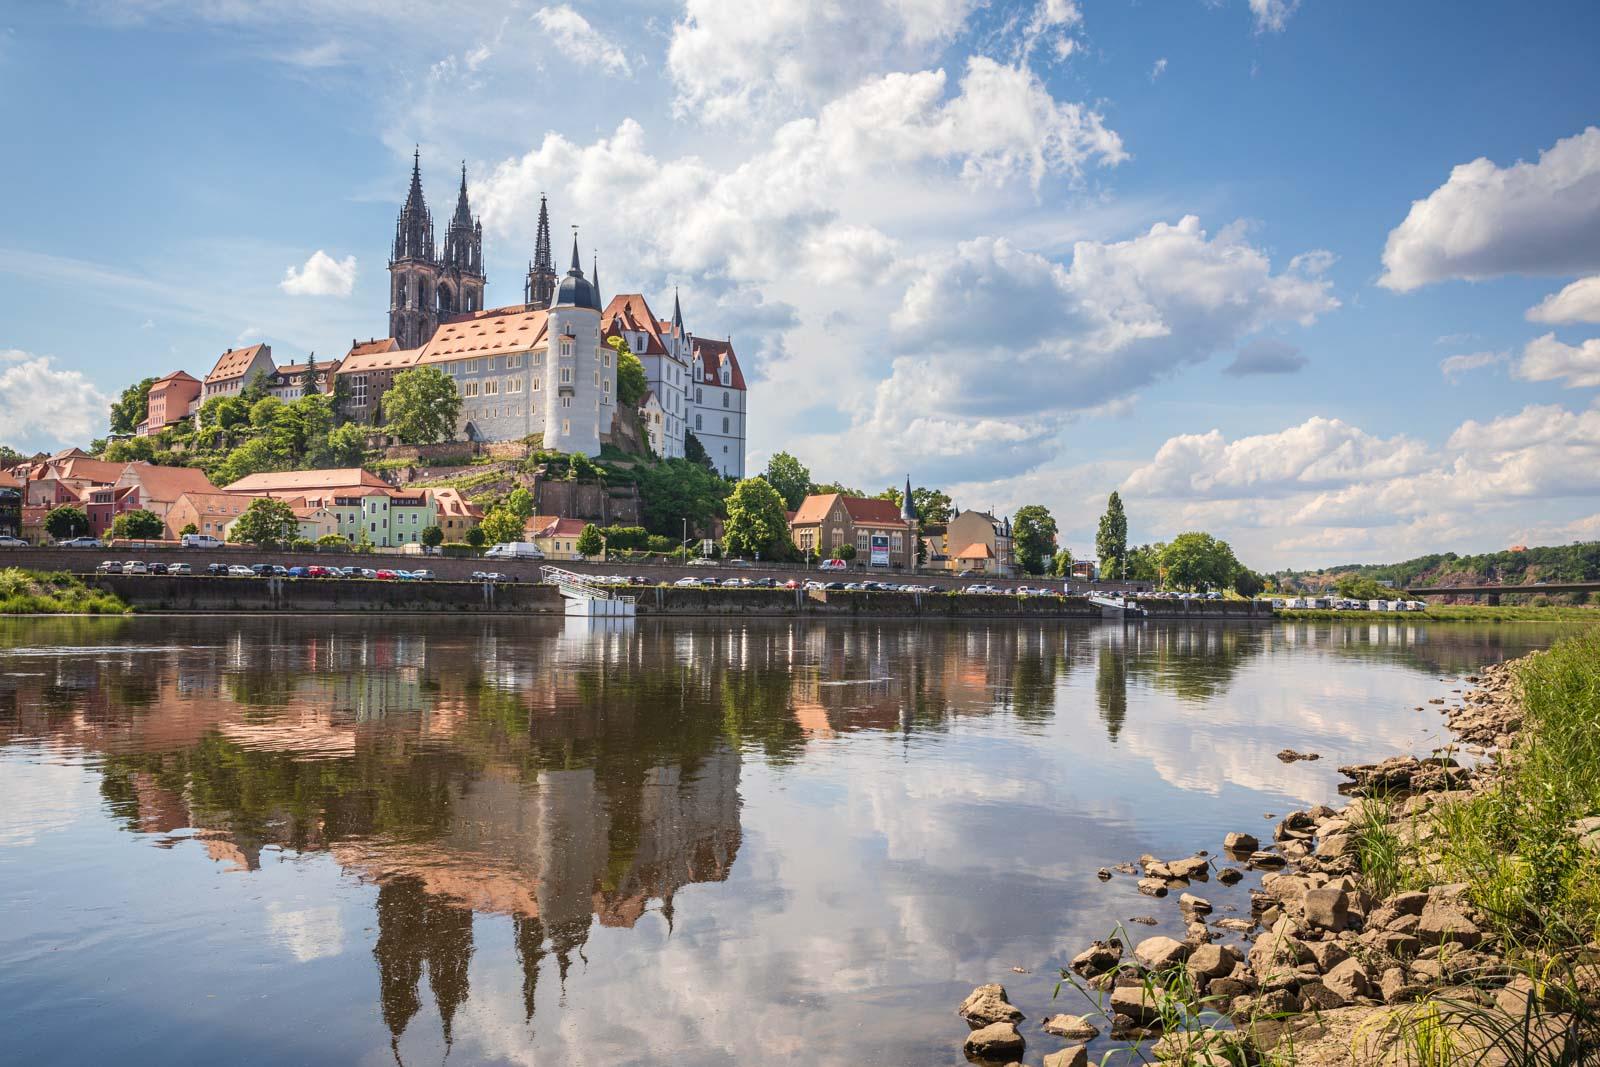 Deutschland, Europa, Europe, Frühling, Germany, Location, Ort, Sachsen, Saxony, Spring, Urlaub, Vaccation